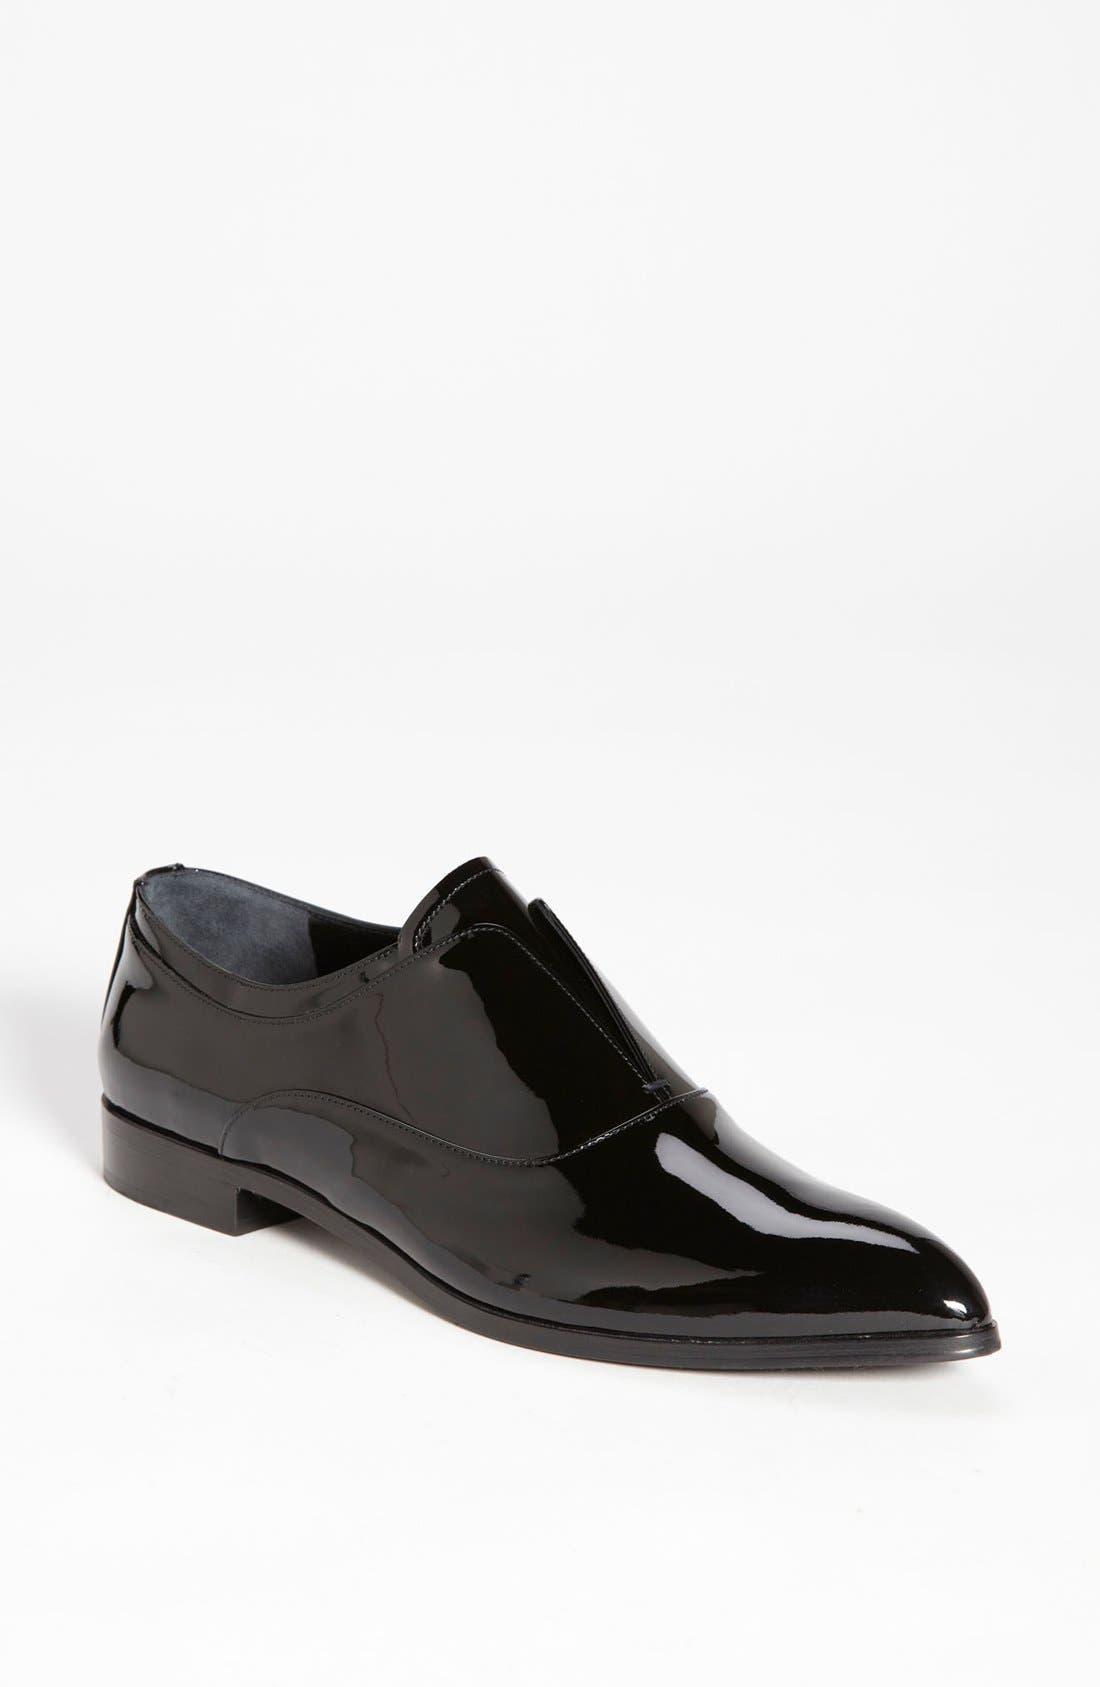 Alternate Image 1 Selected - Prada Laceless Pointy Toe Oxford